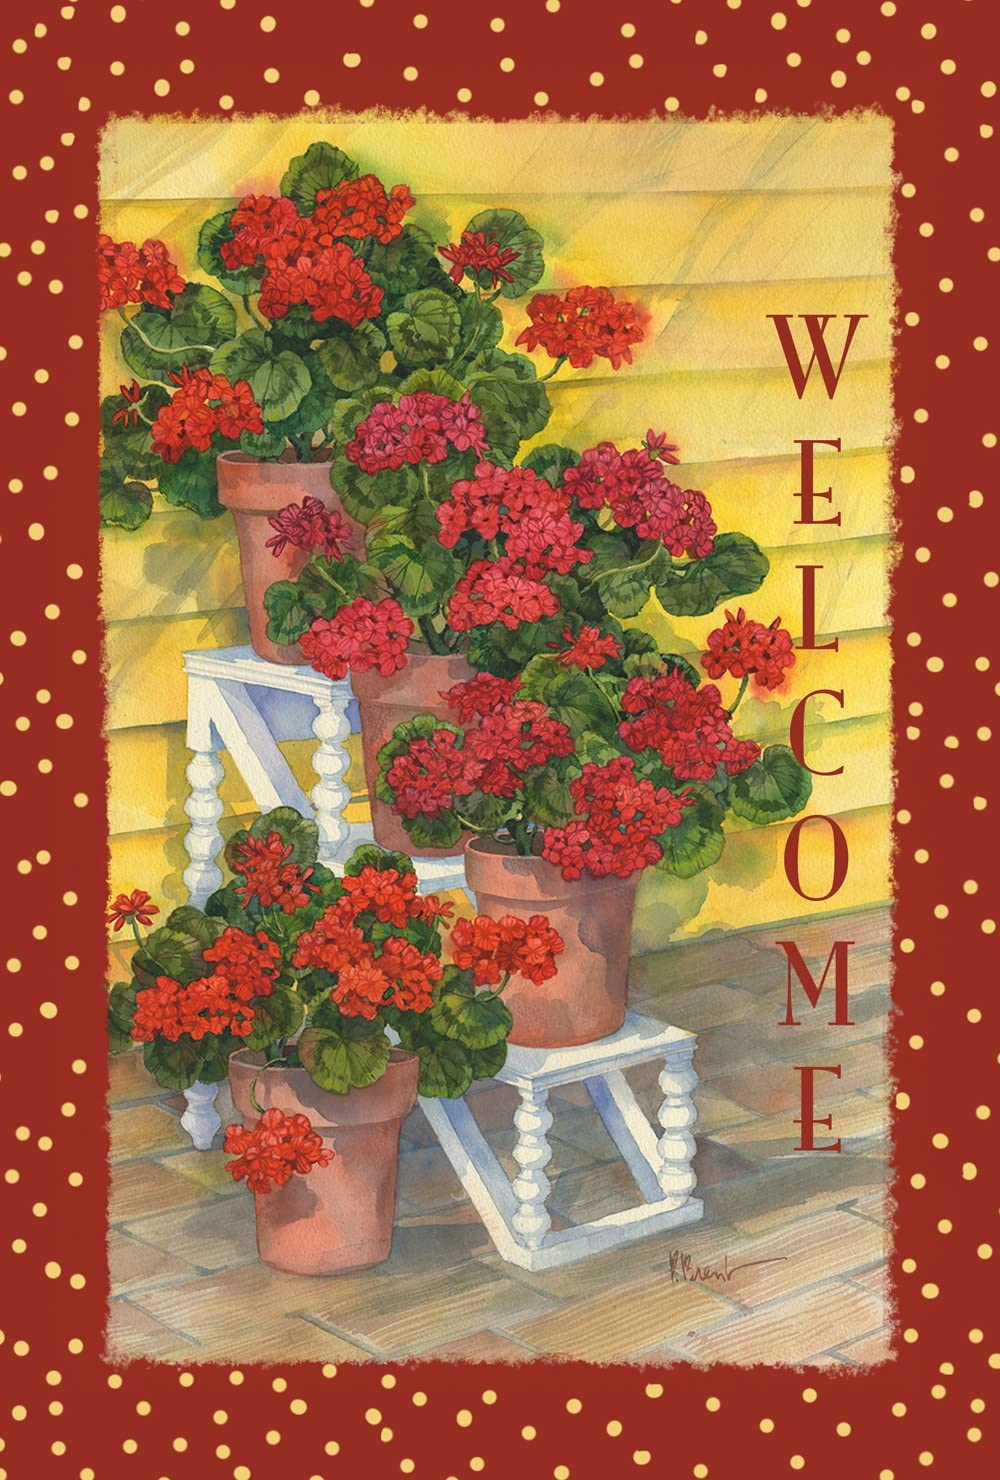 Toland Home Garden Polka Dot Geraniums 28 x 40 Inch Decorative Red Summer Flower Welcome House Flag